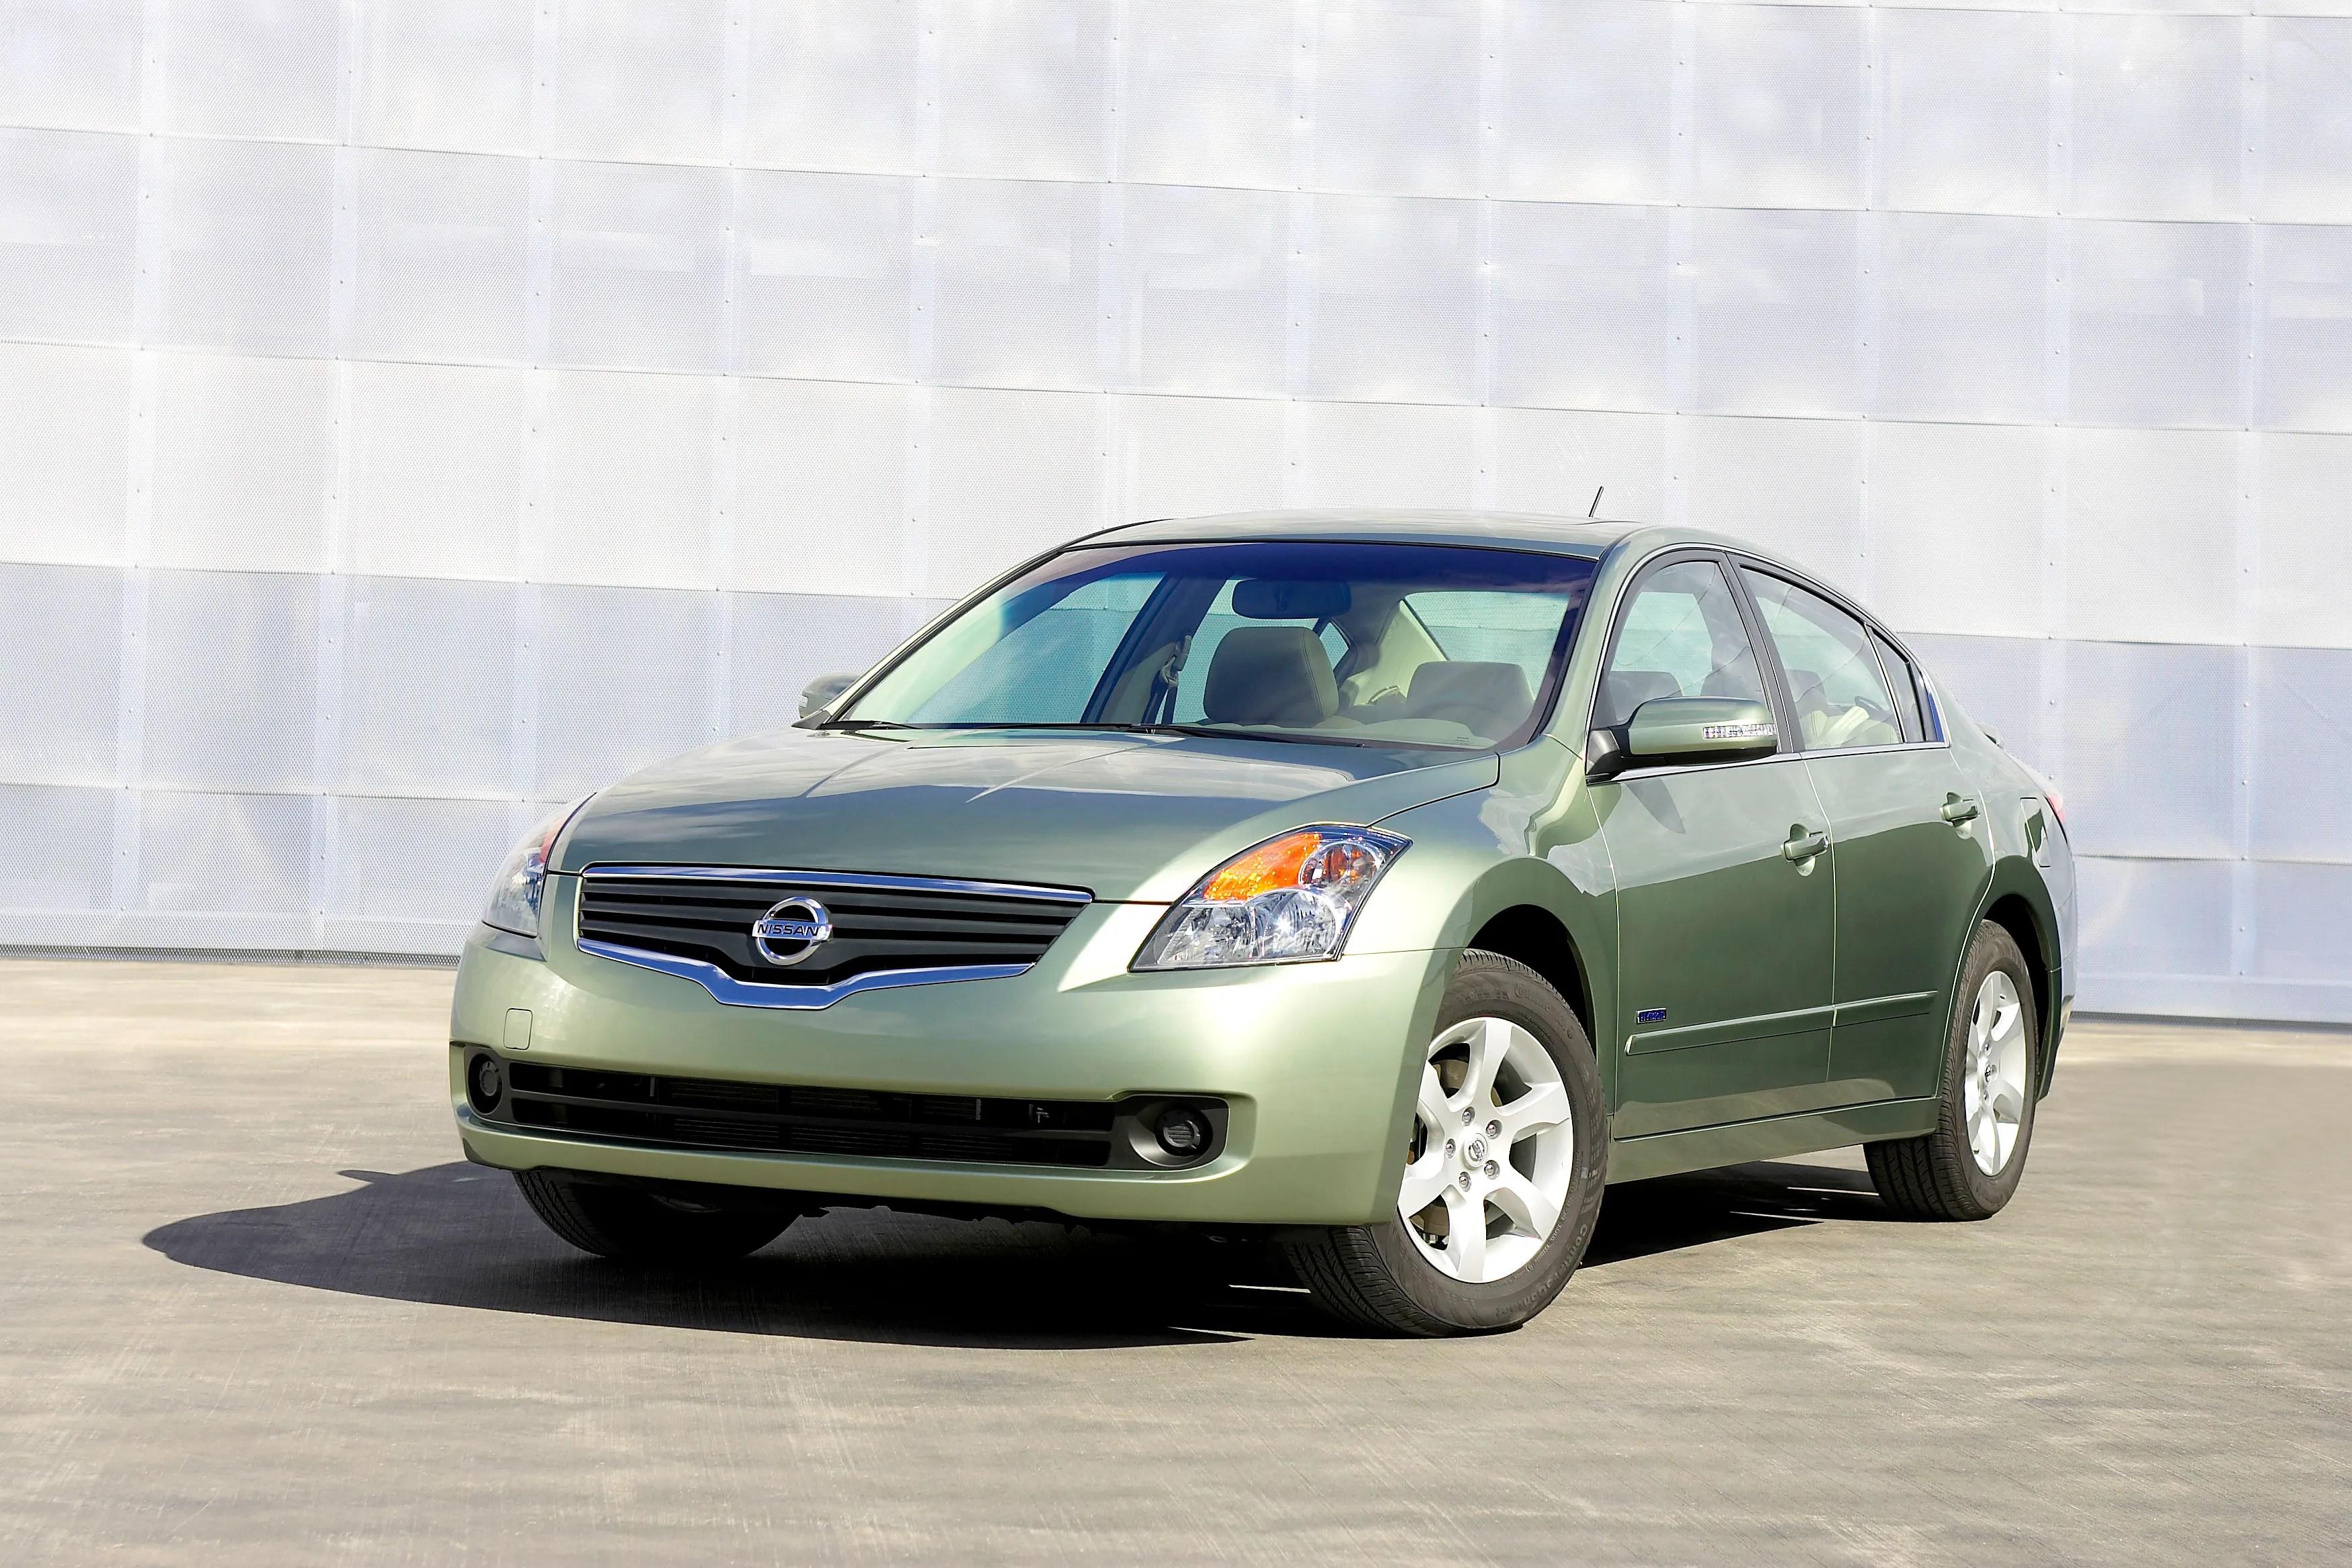 2009 Nissan Altima Hybrid Top Speed